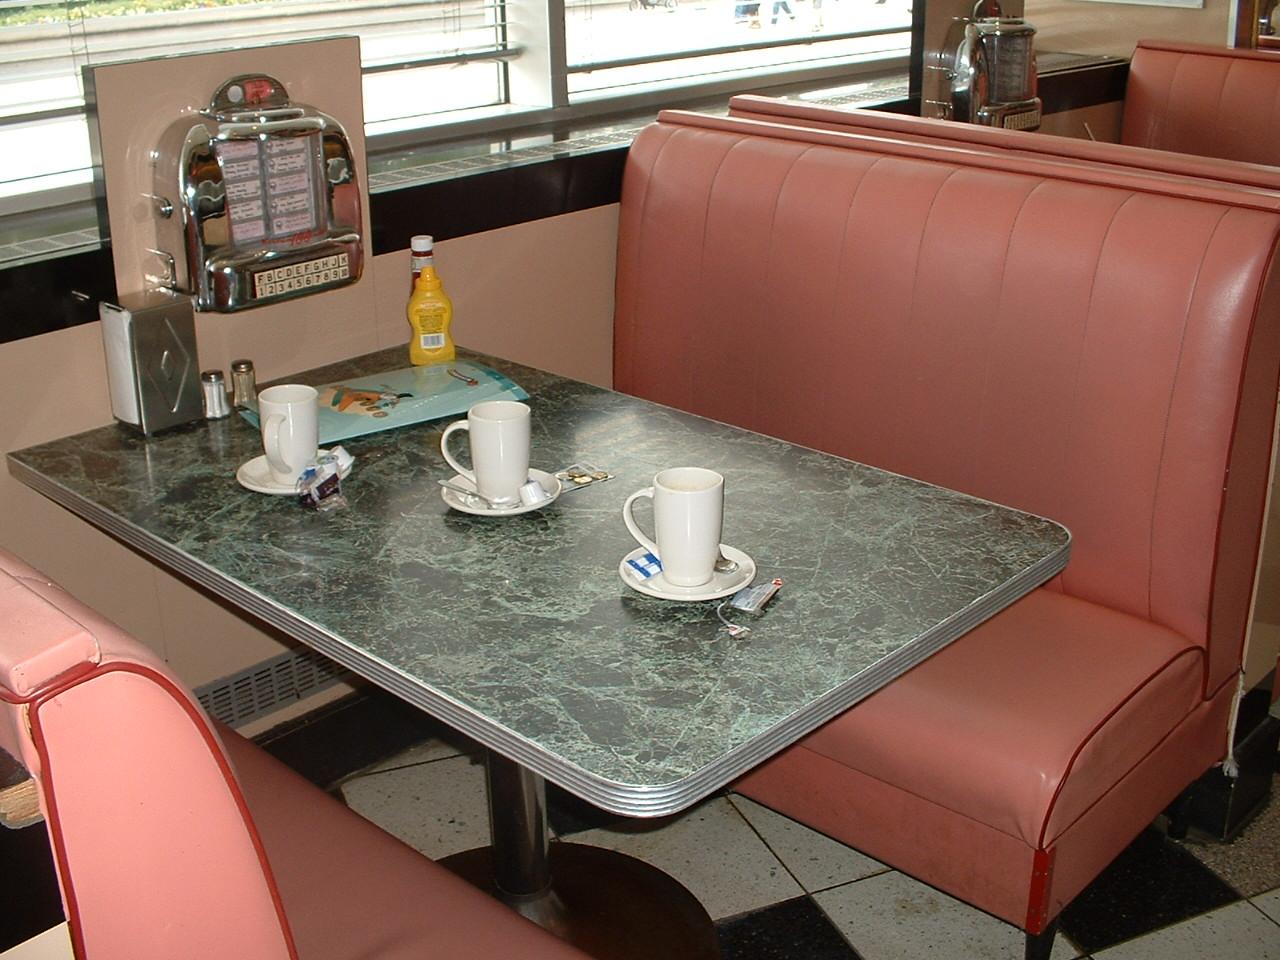 file annette 39 s diner wikimedia commons. Black Bedroom Furniture Sets. Home Design Ideas